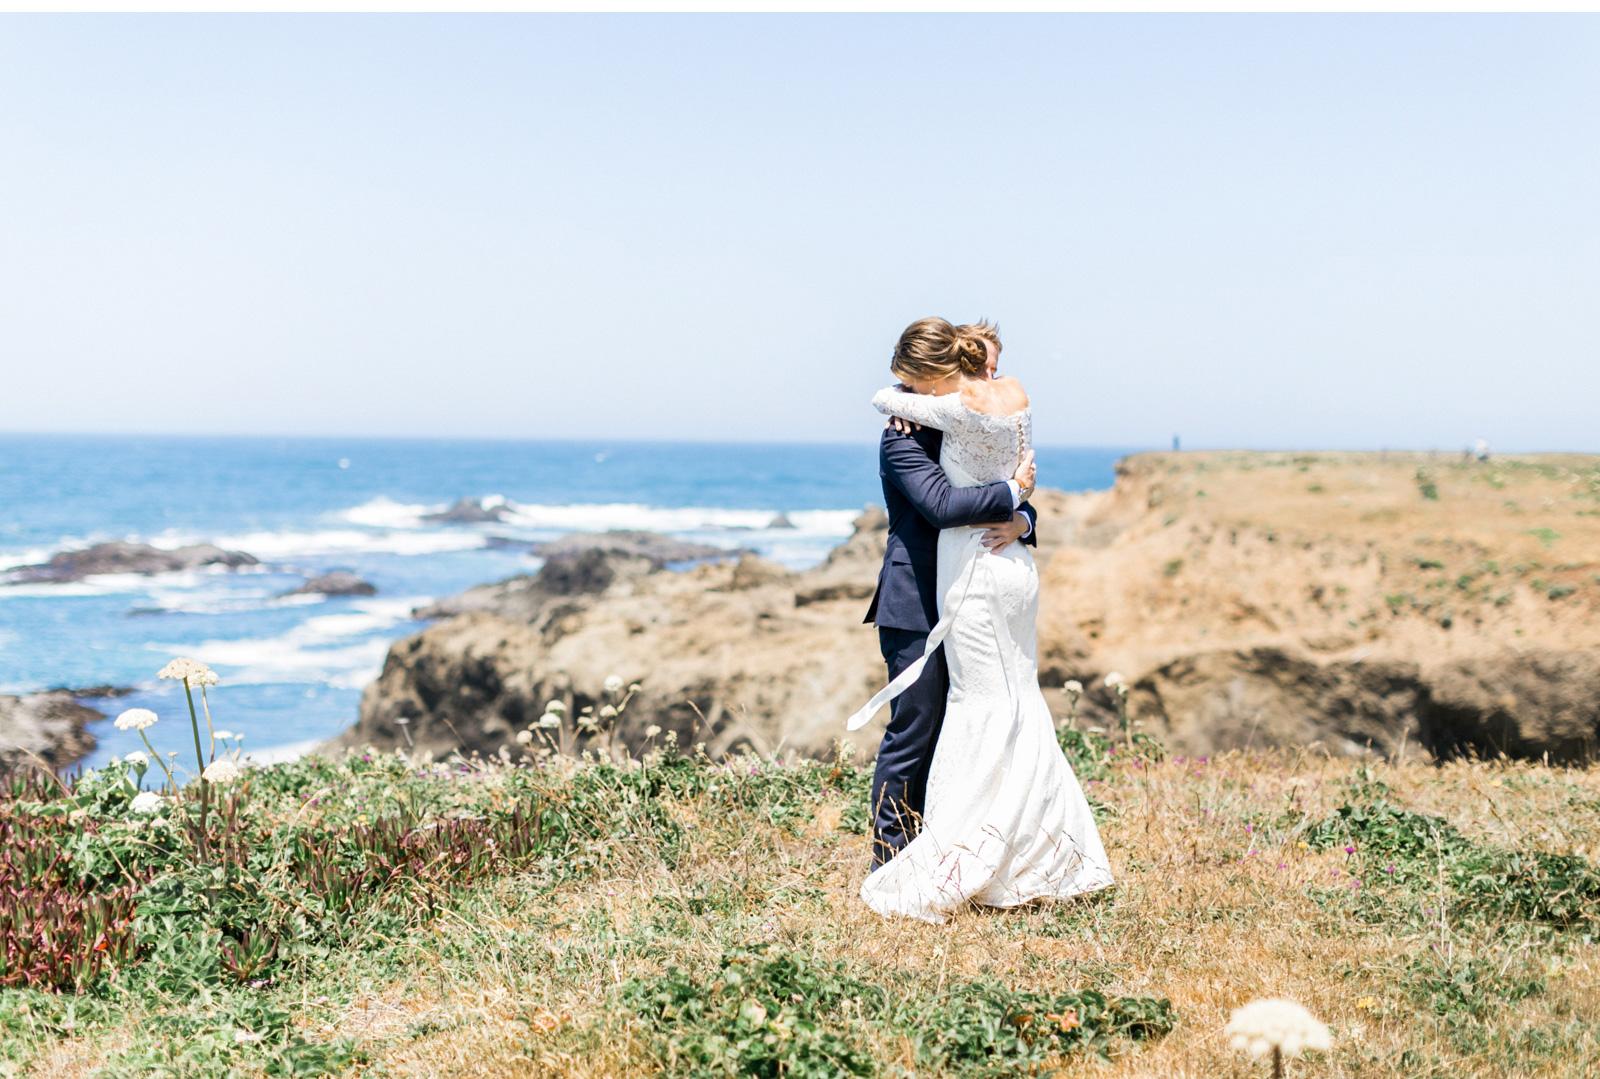 Mendocino-Wedding-Natalie-Schutt-Photography_04.jpg